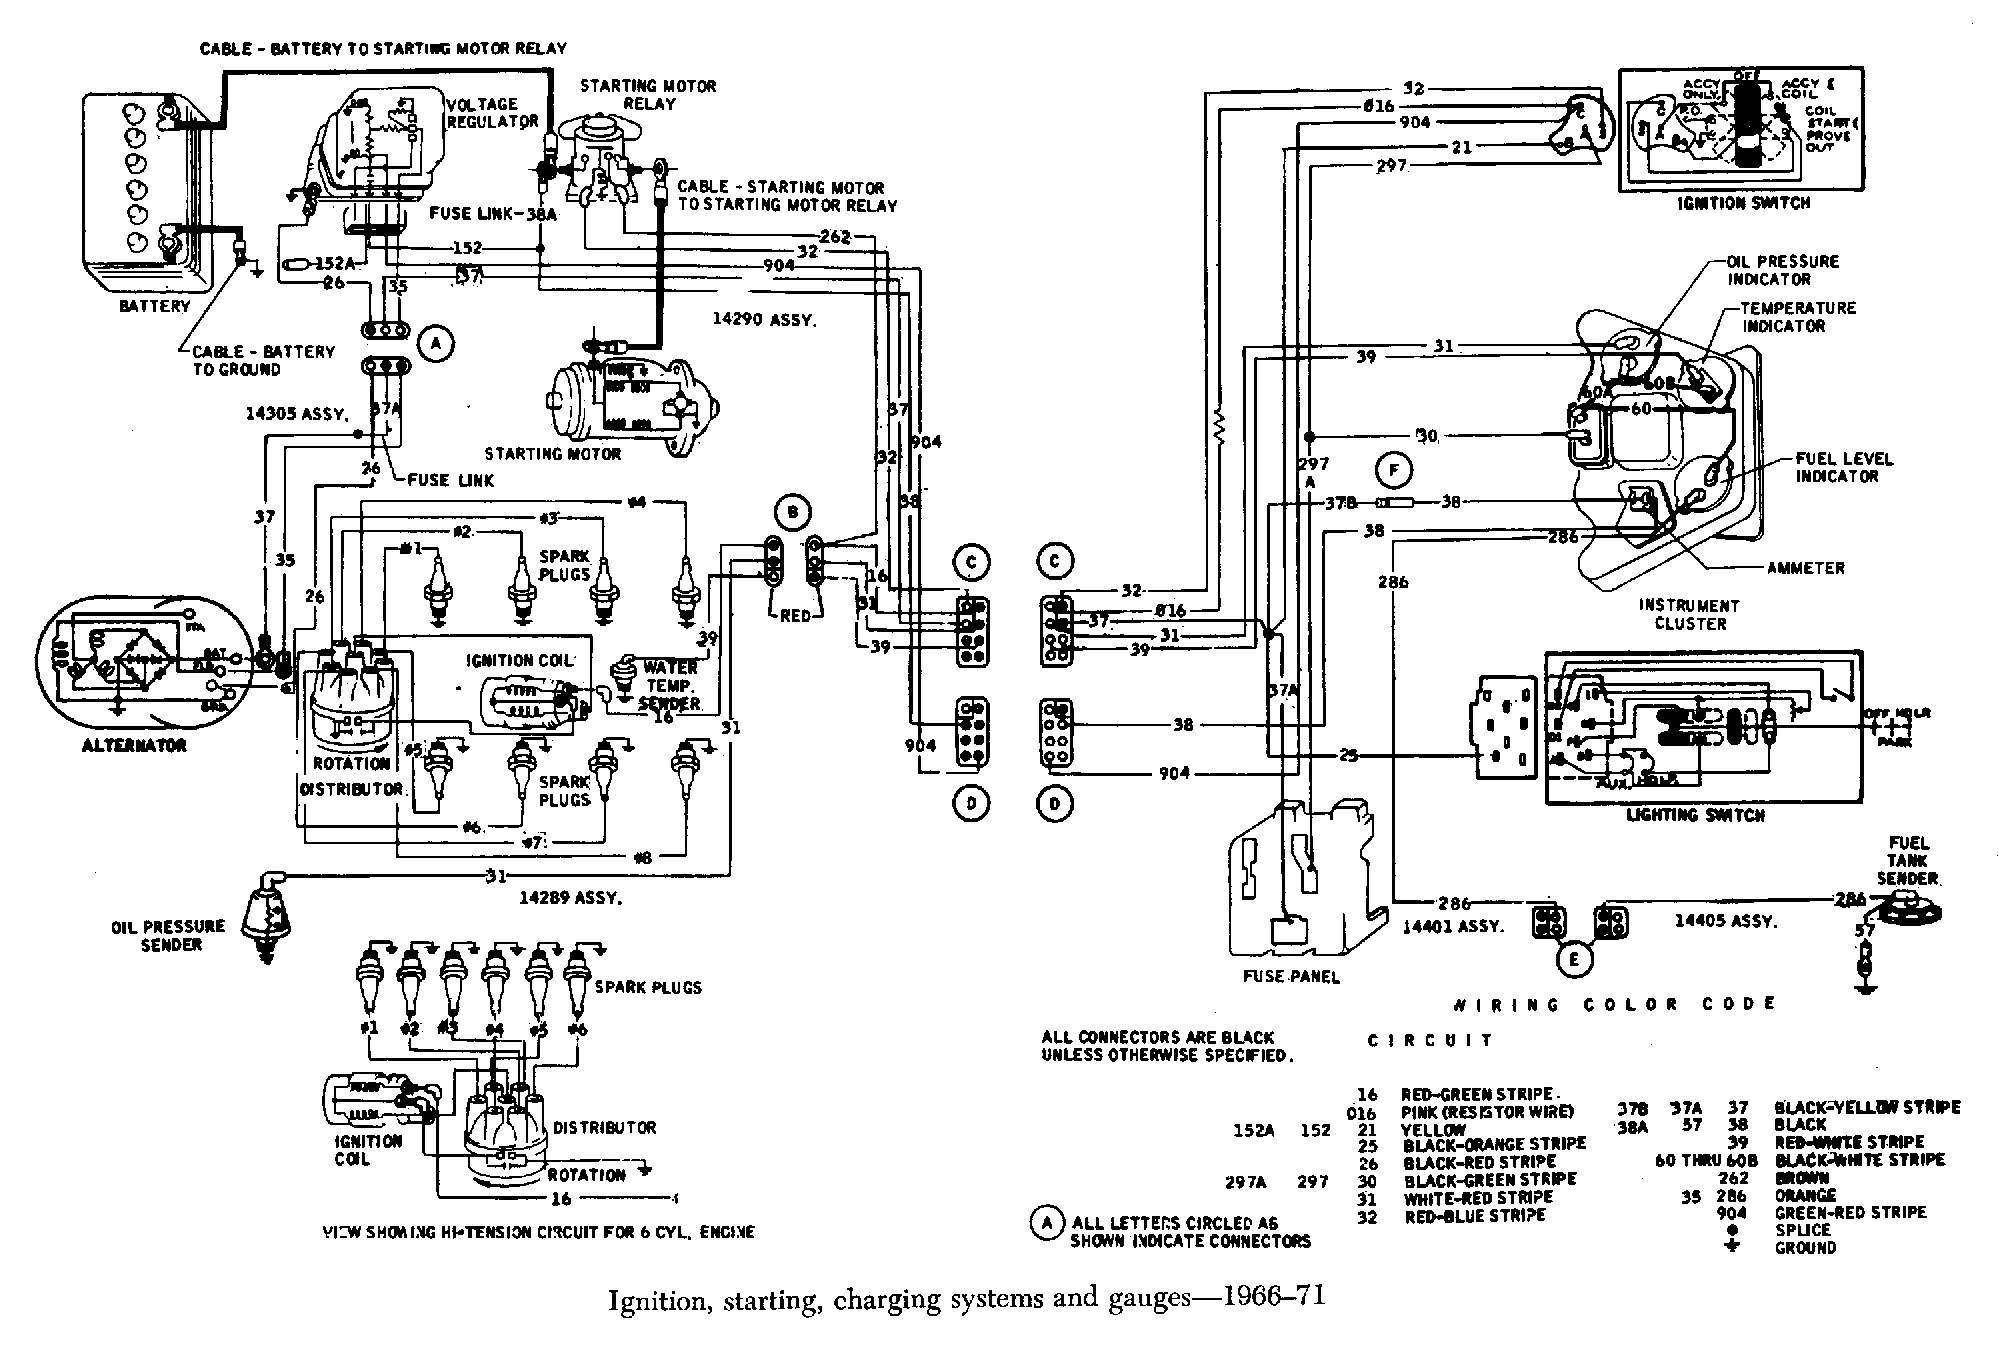 Spark Plug Wiring Diagram Chevy 350 | Switch Wiring Diagram Free - Spark Plug Wiring Diagram Chevy 350